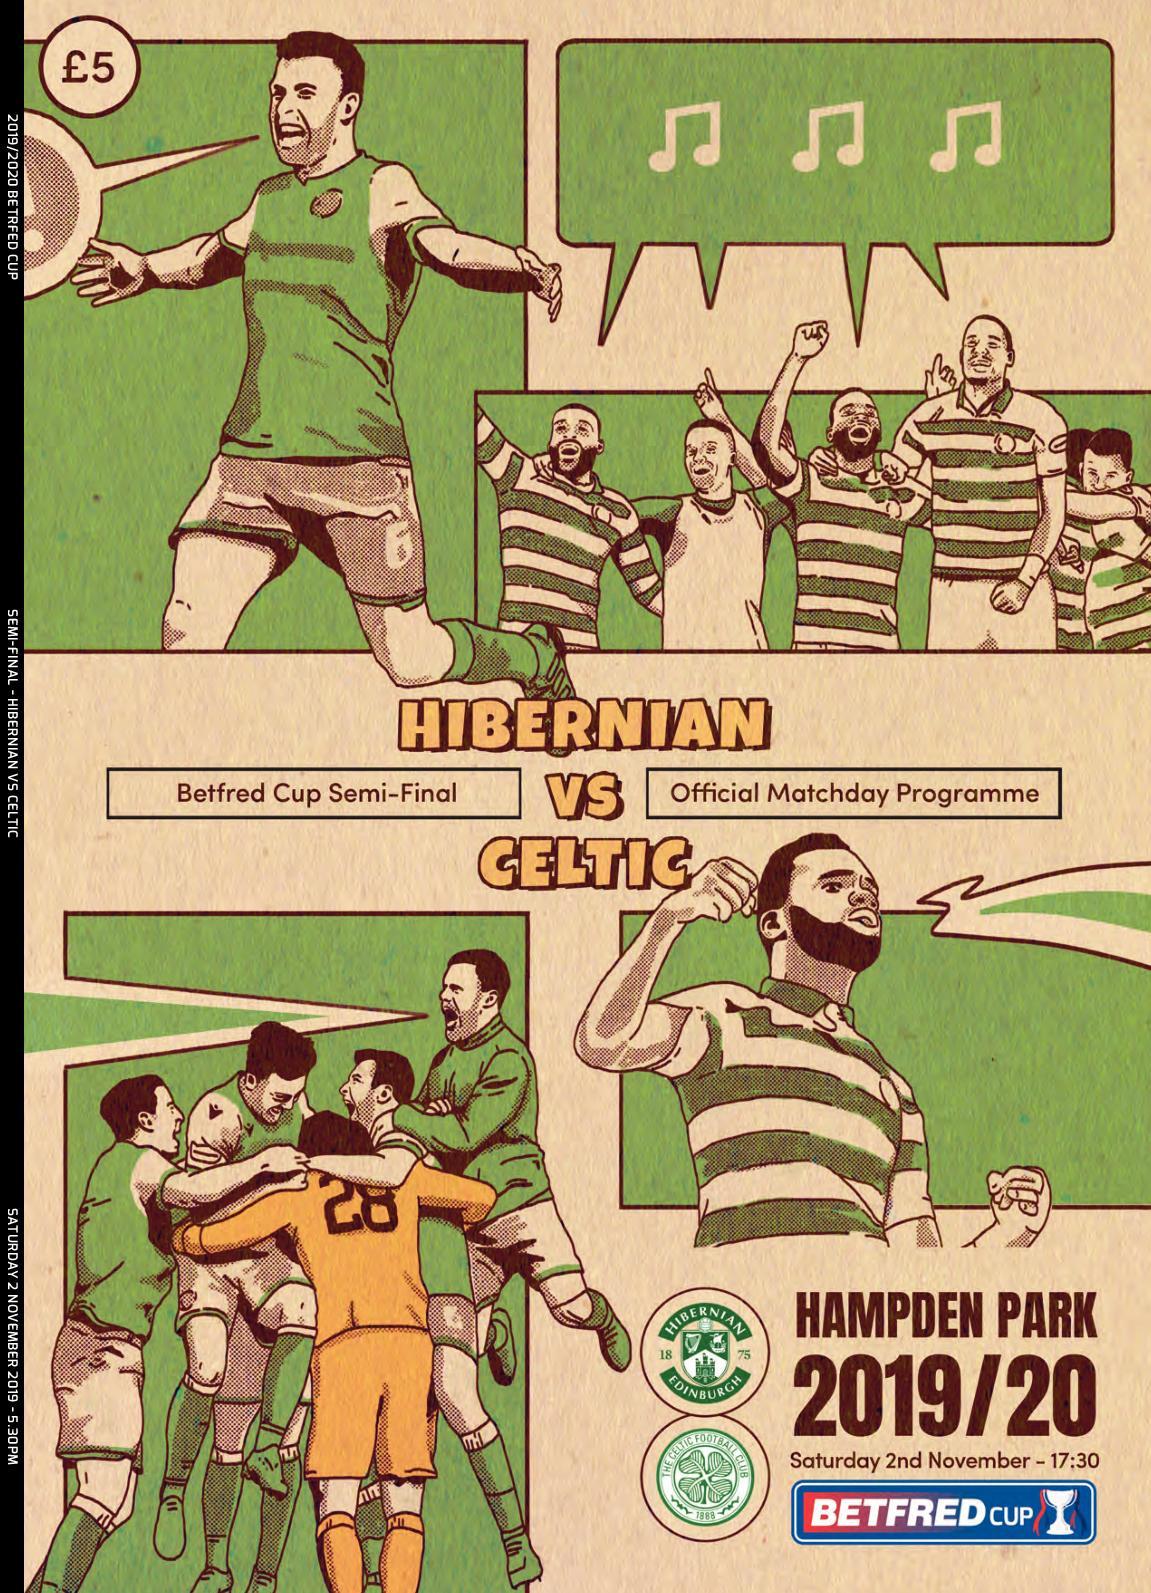 BILLY WILLIAMSON TOPPS-FOOTBALL SCOTTISH YELLOW BACK 1977 -#022- ABERDEEN